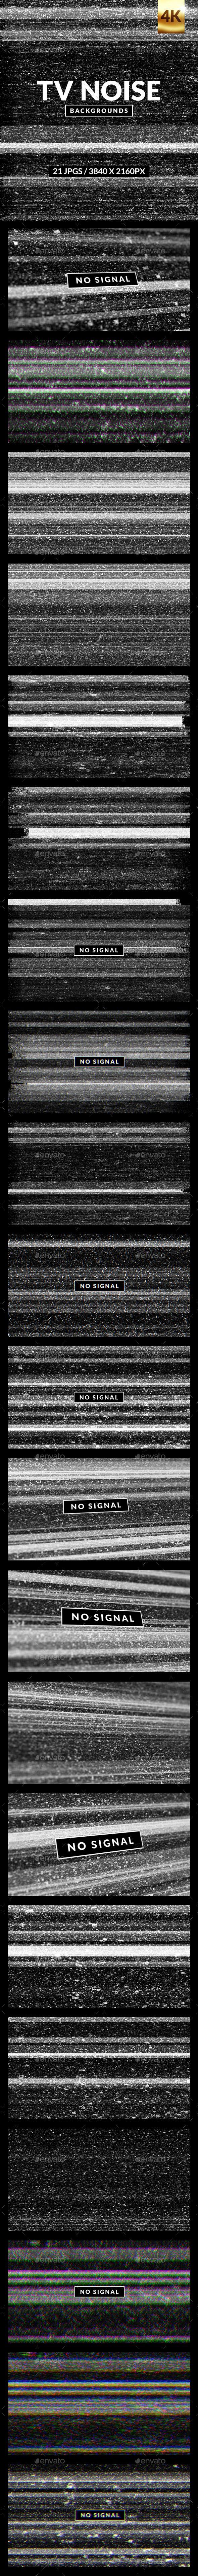 Static tv noise texture  No signal label  Glitch effect